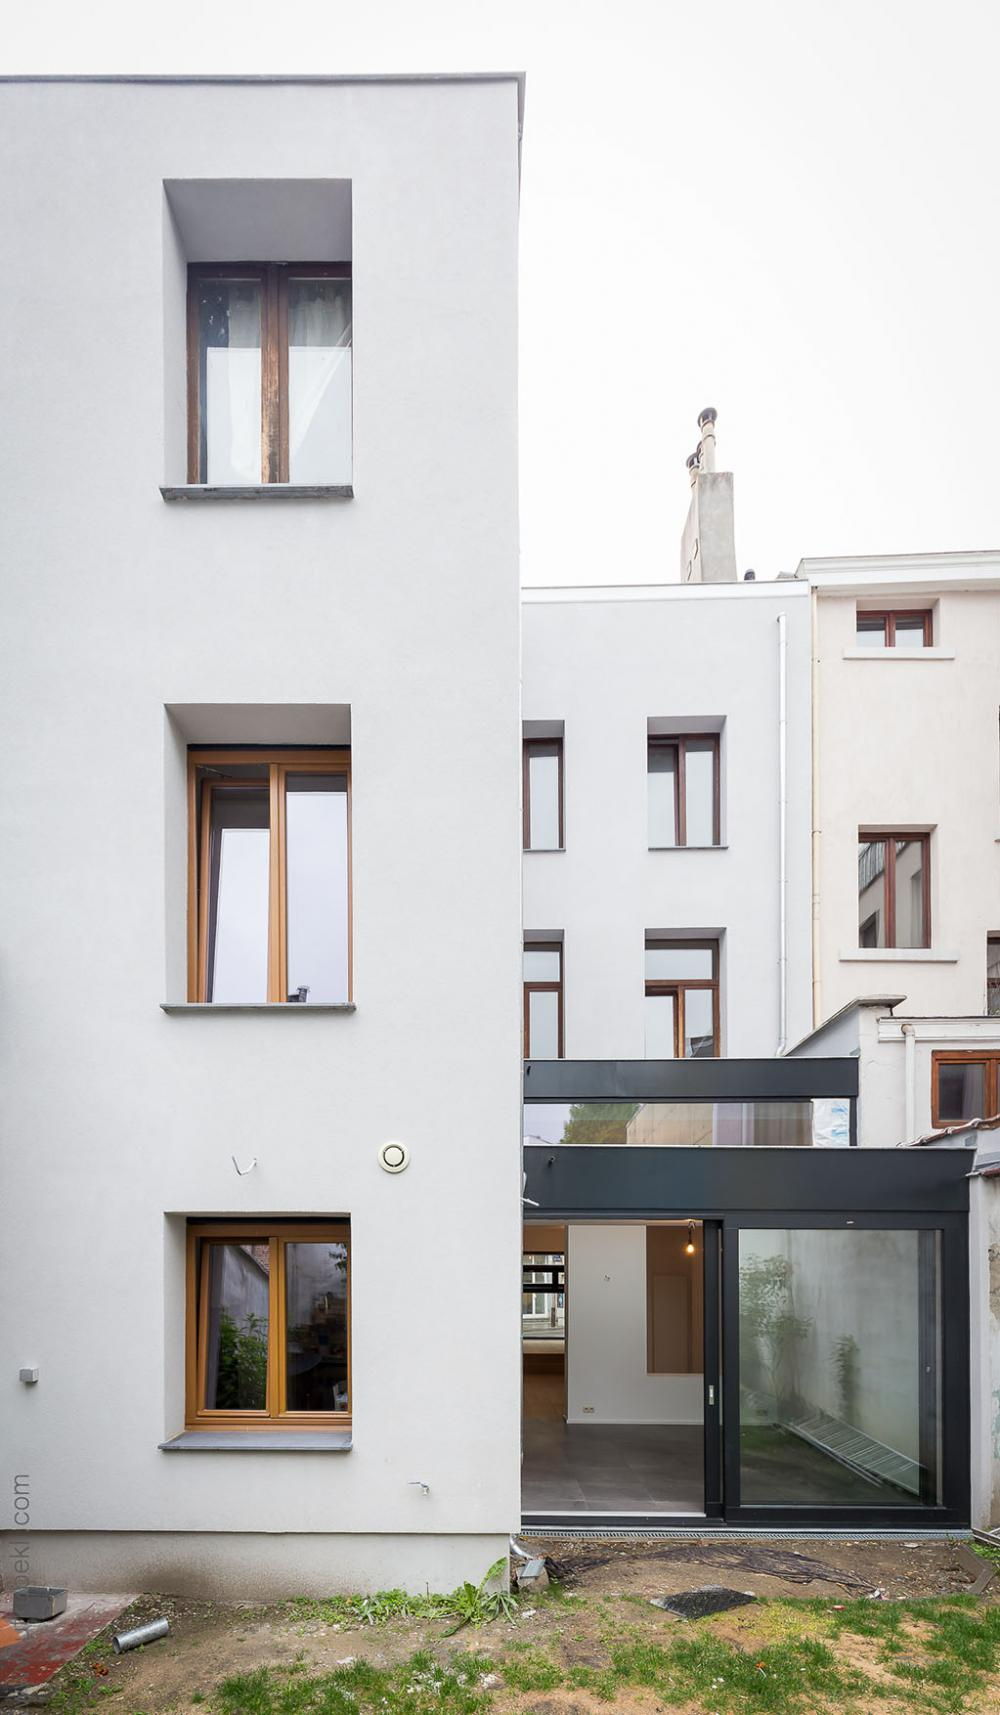 photographie la façade jardin de la maison Dublin